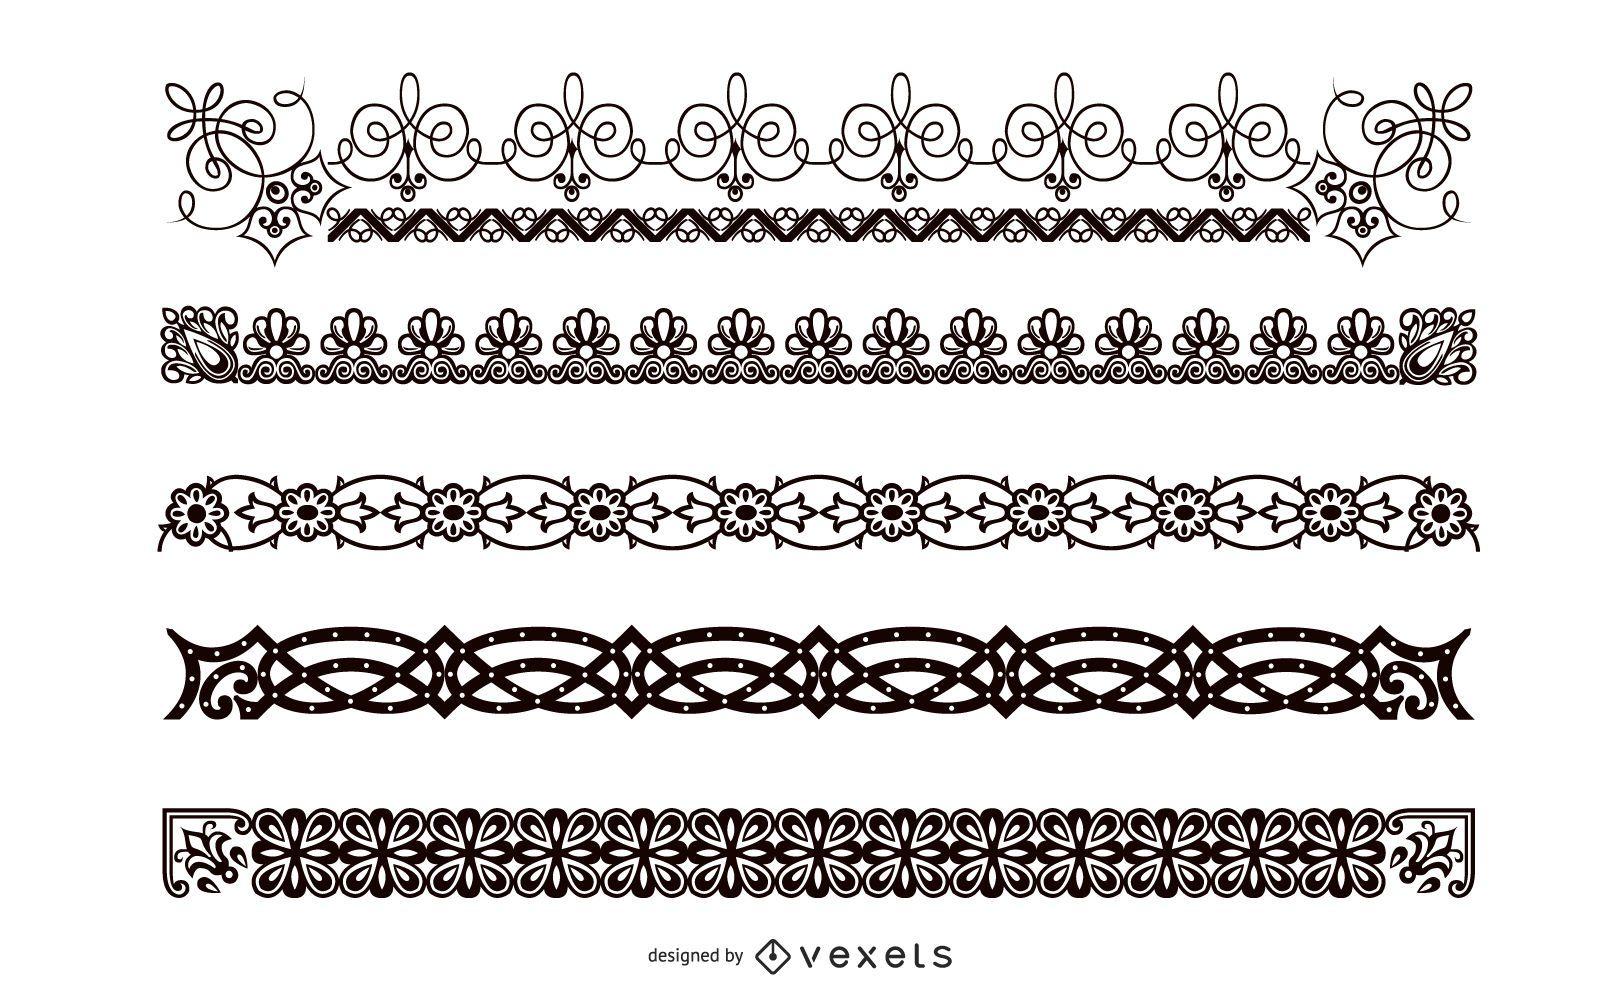 Abstract Black & White Border Set